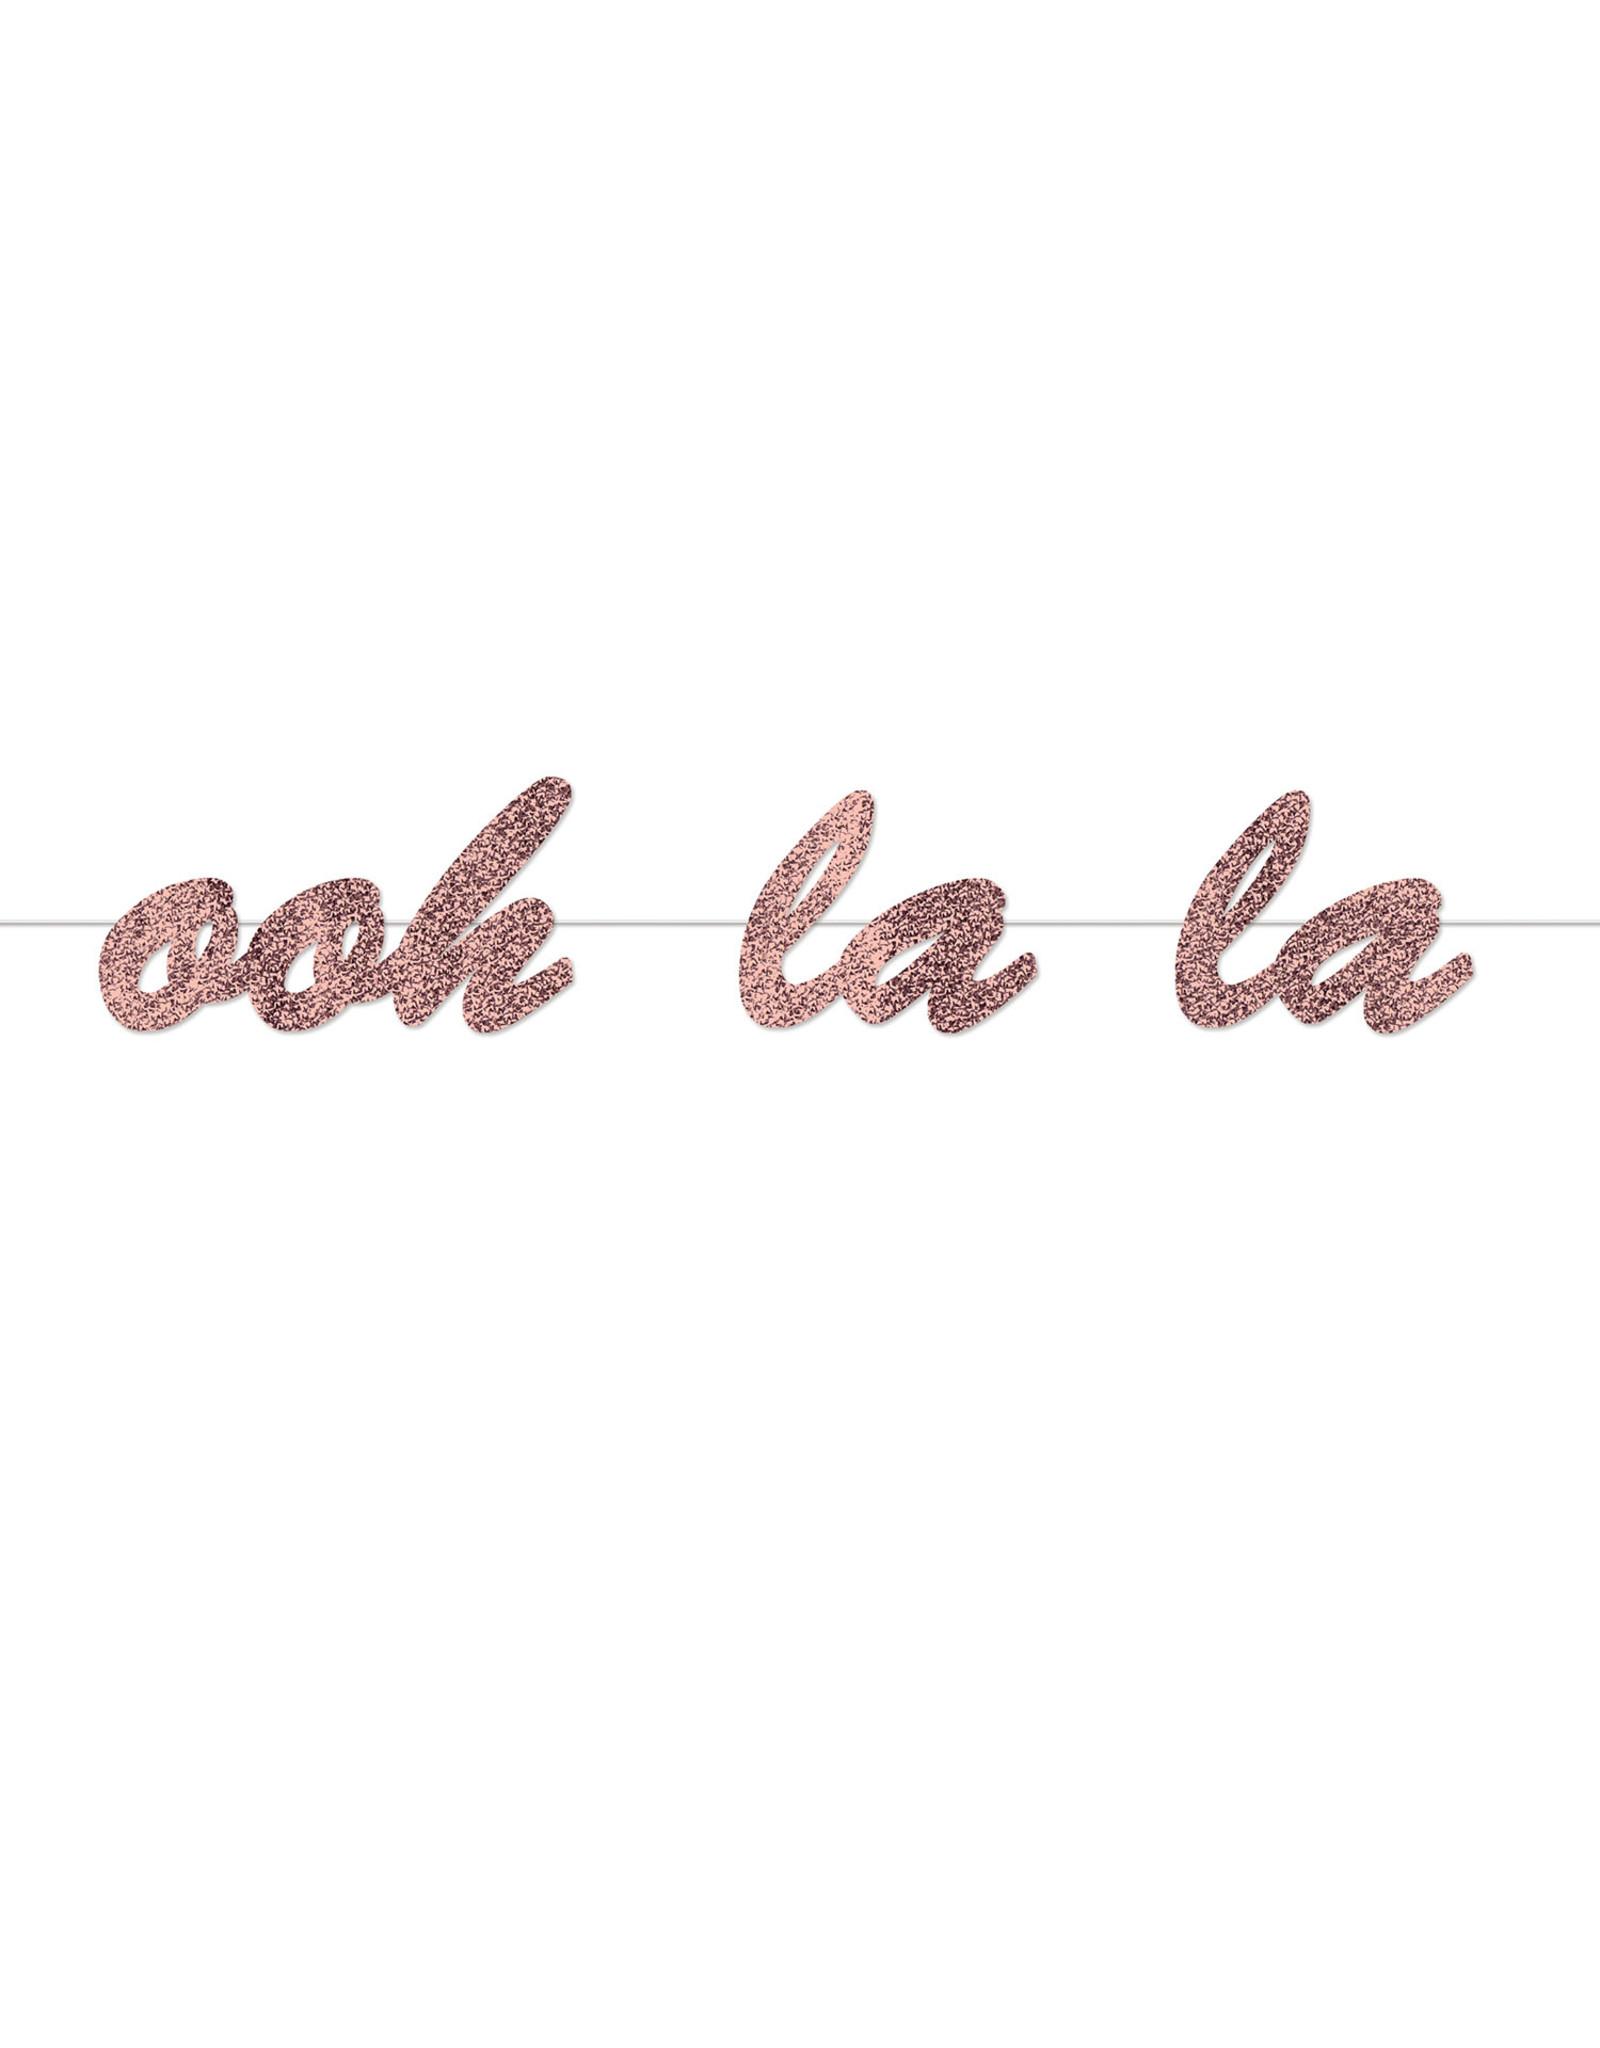 Beistle Ooh-La-La Banner - 4ft.